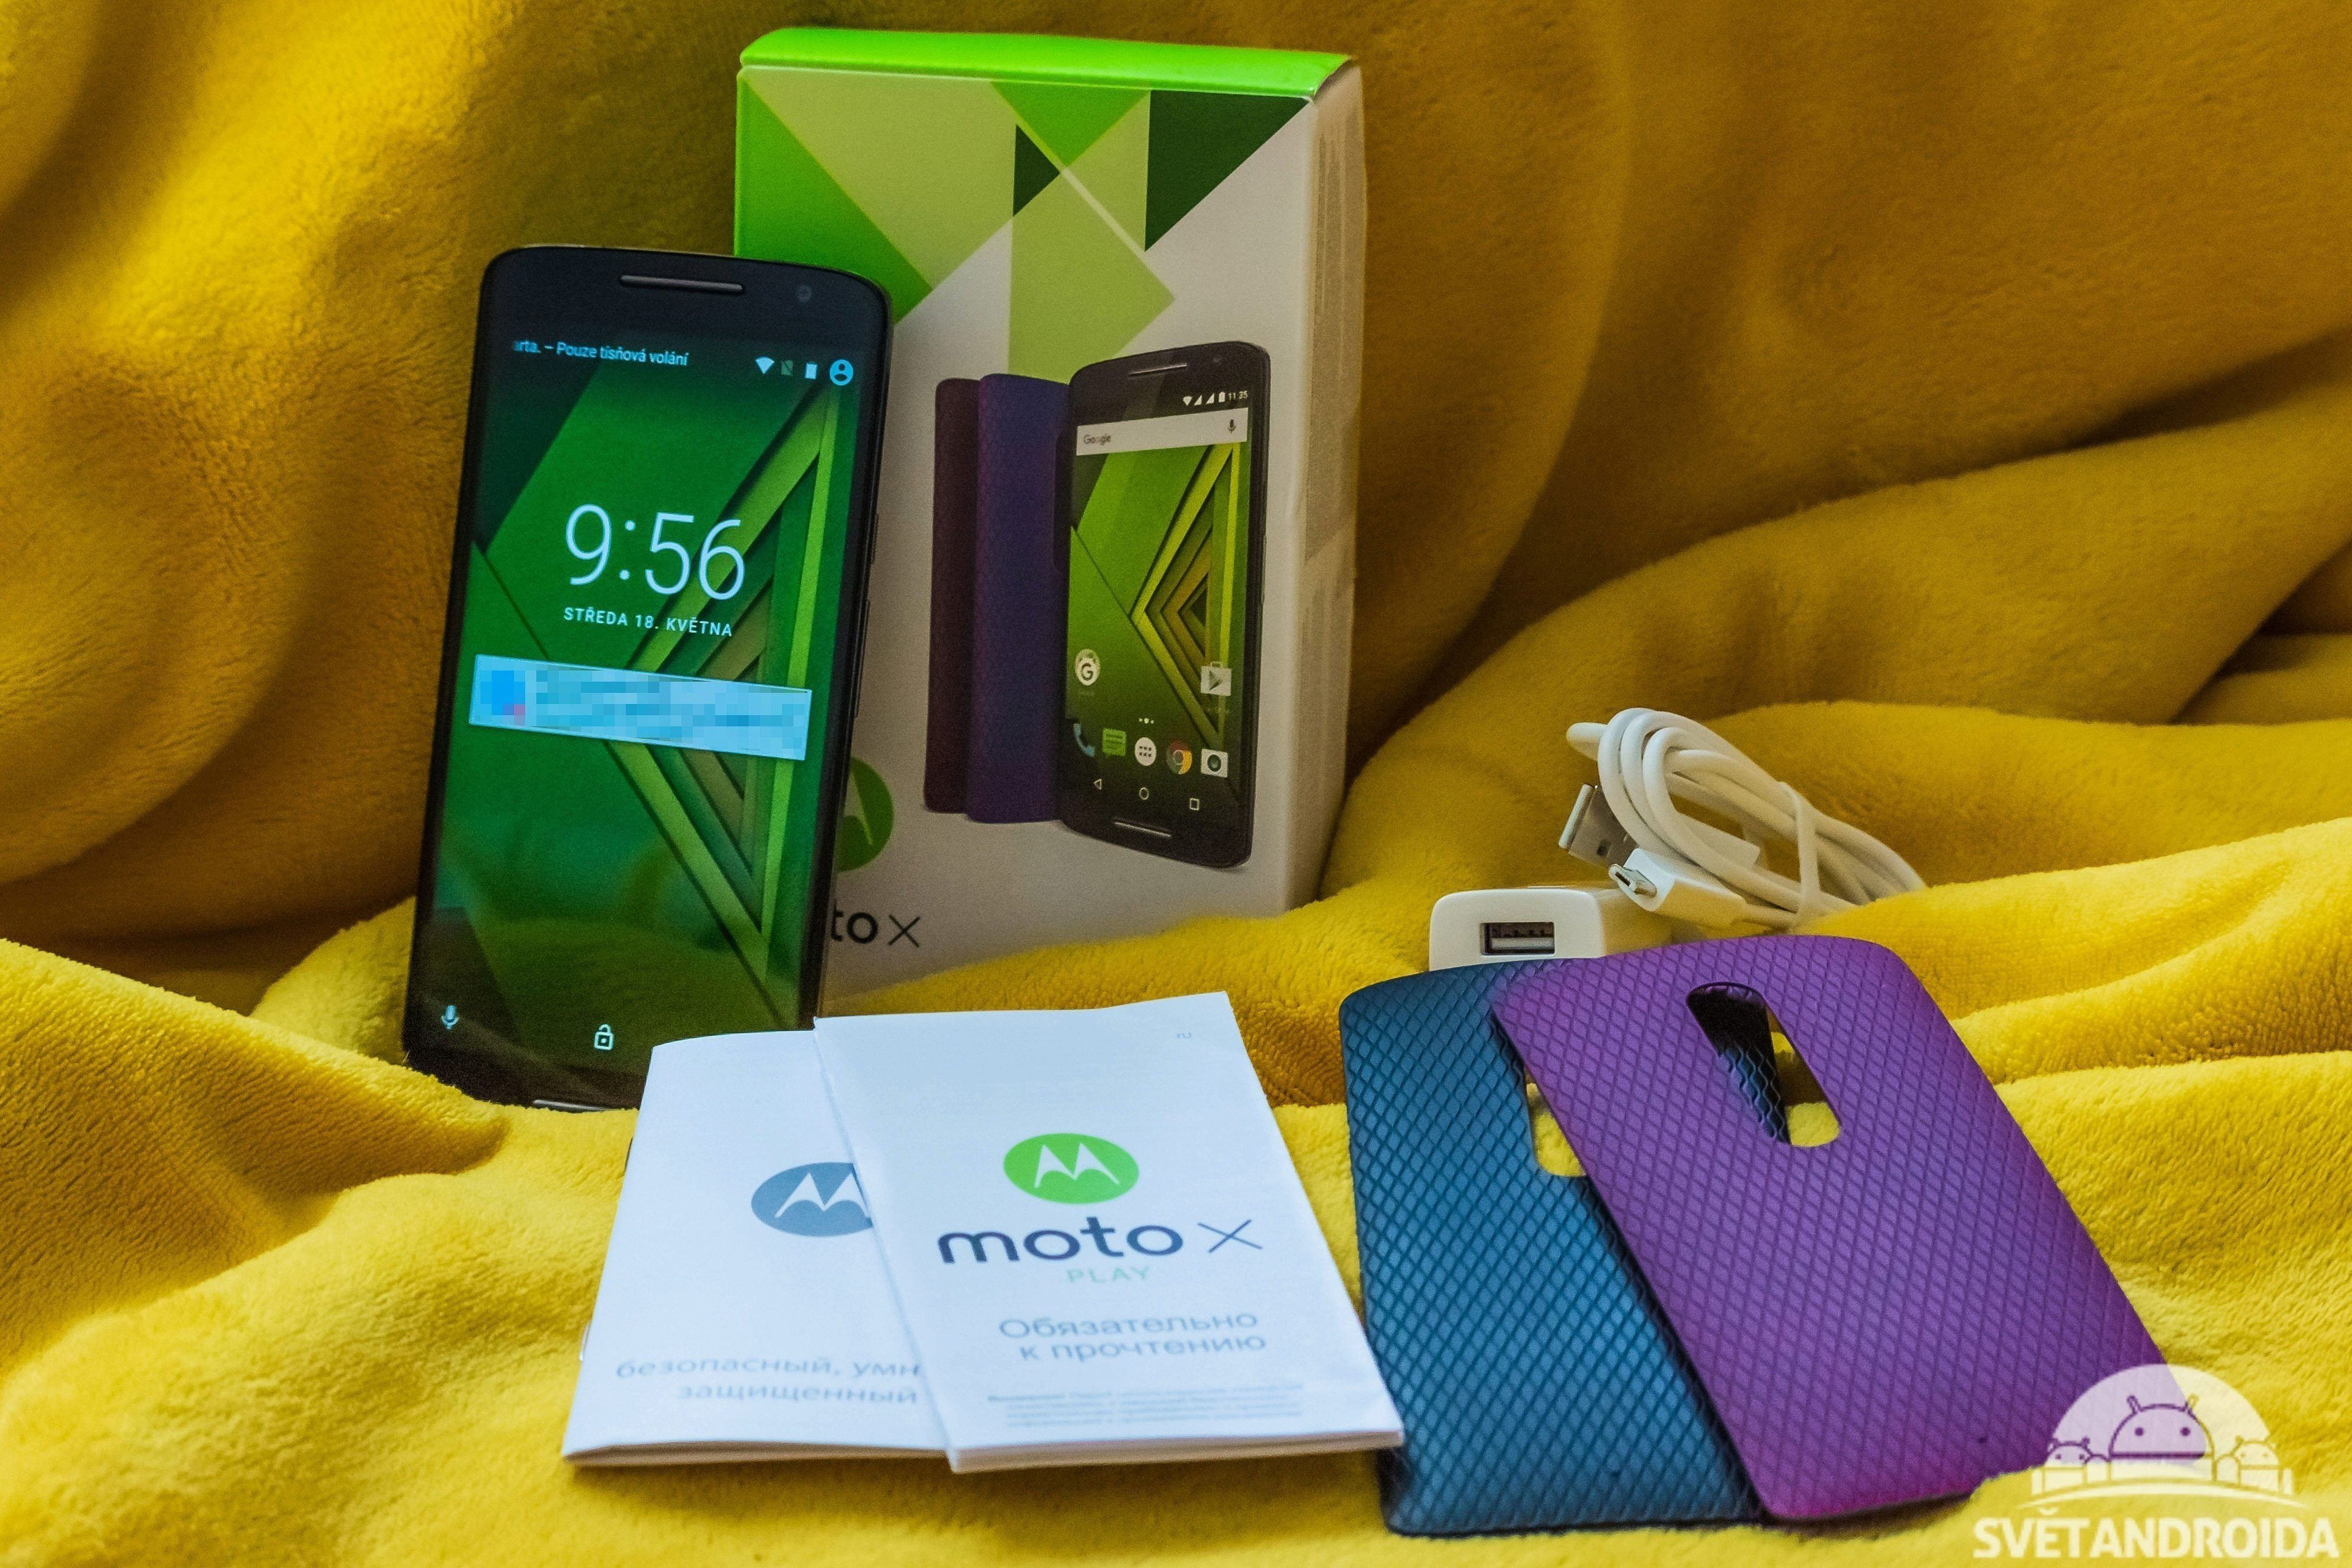 Moto X Play - obsah balení